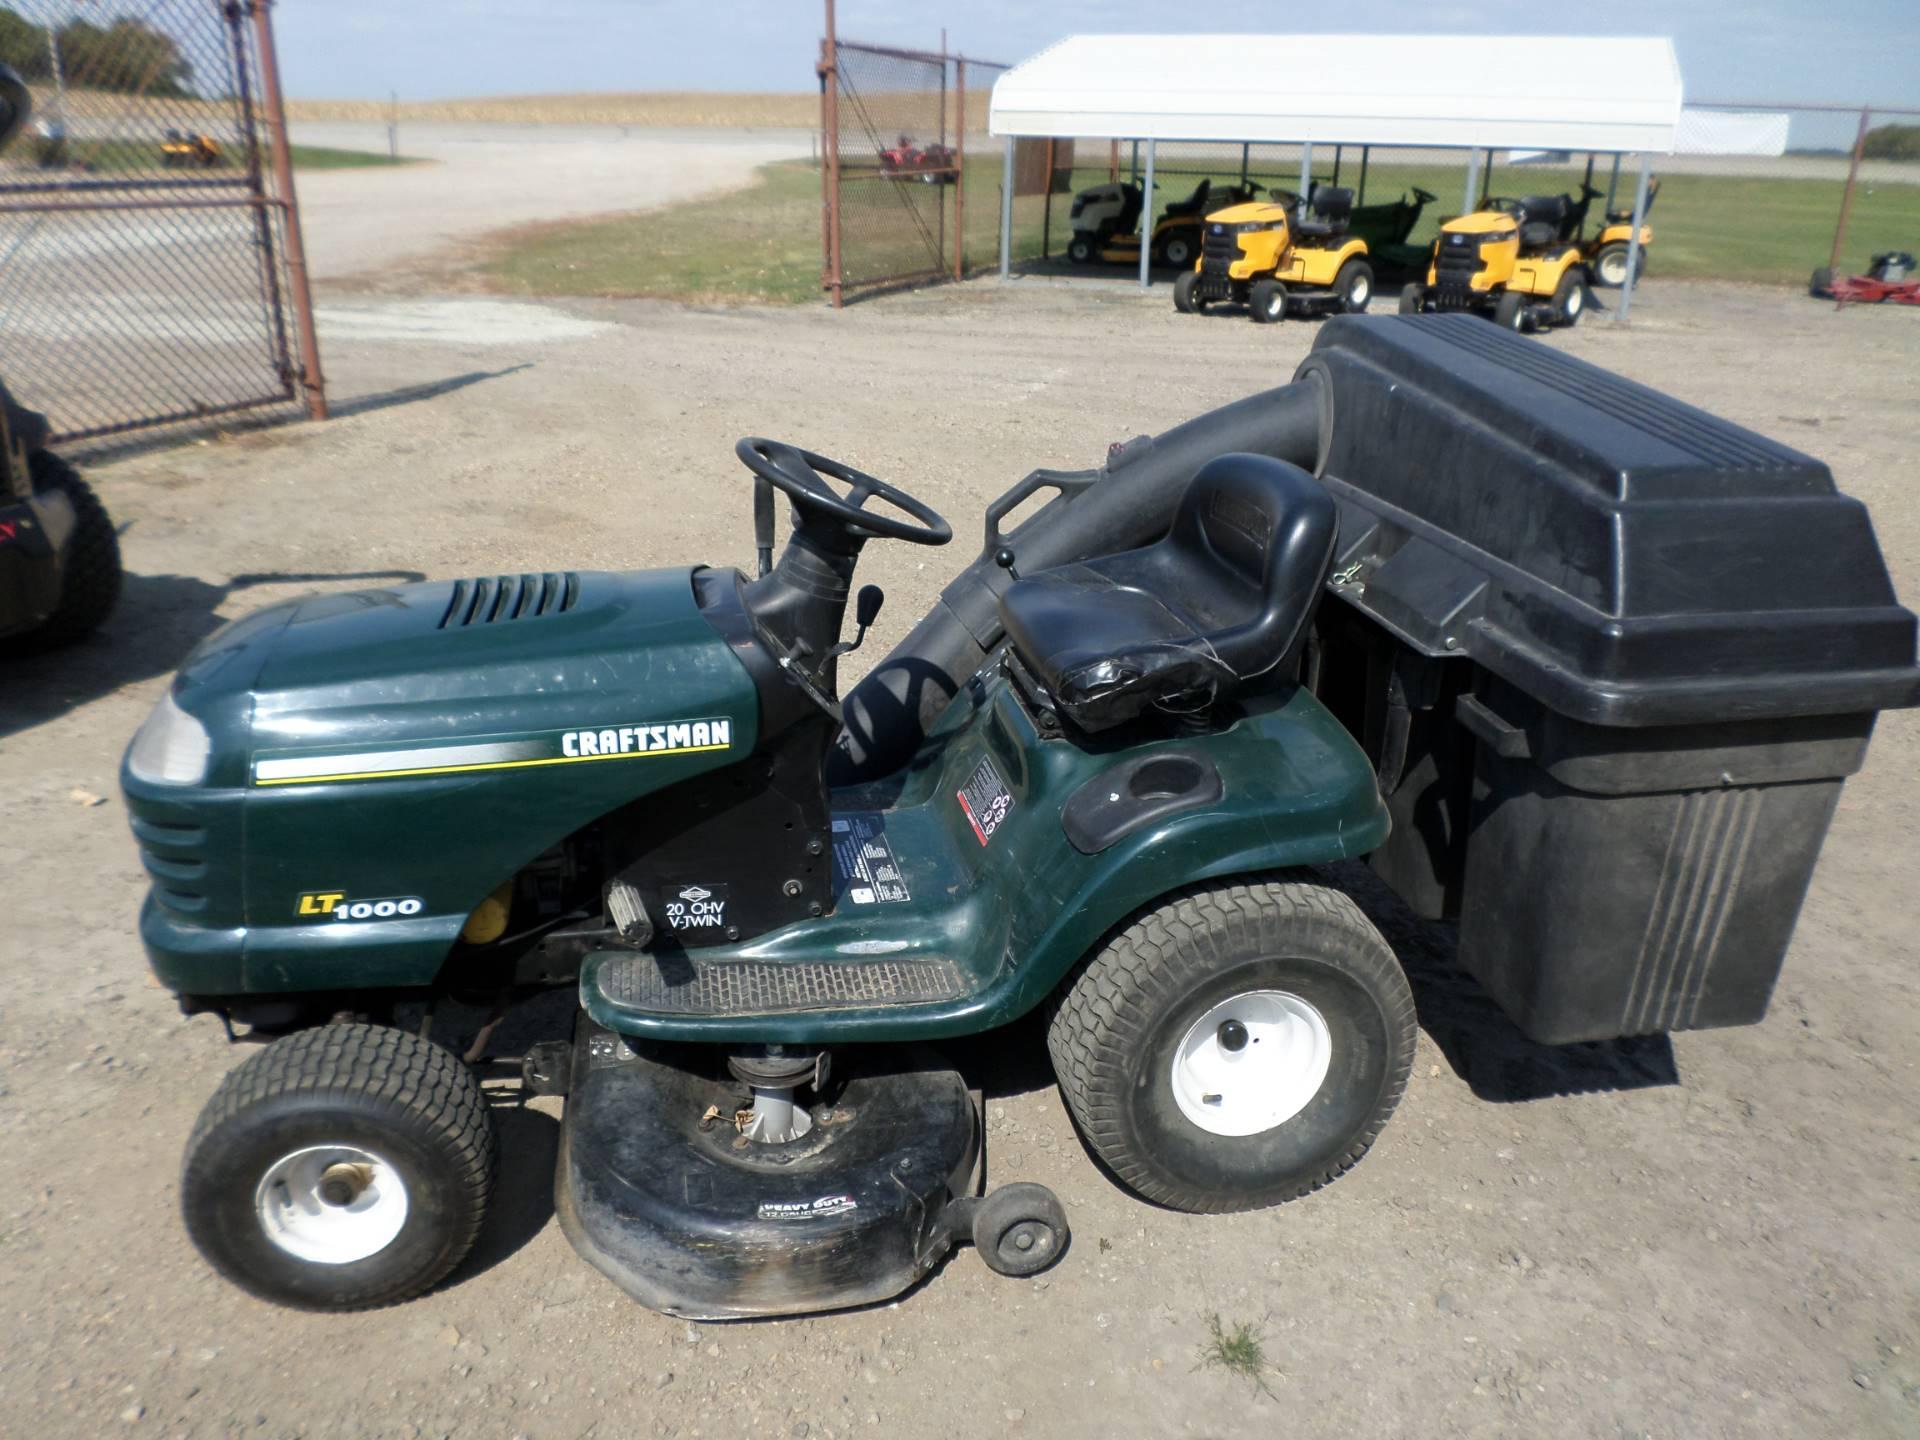 Craftsman Lt1000 Riding Mower >> Used 2001 Craftsman Lt1000 Lawn Mowers In Lake Mills Ia Stock